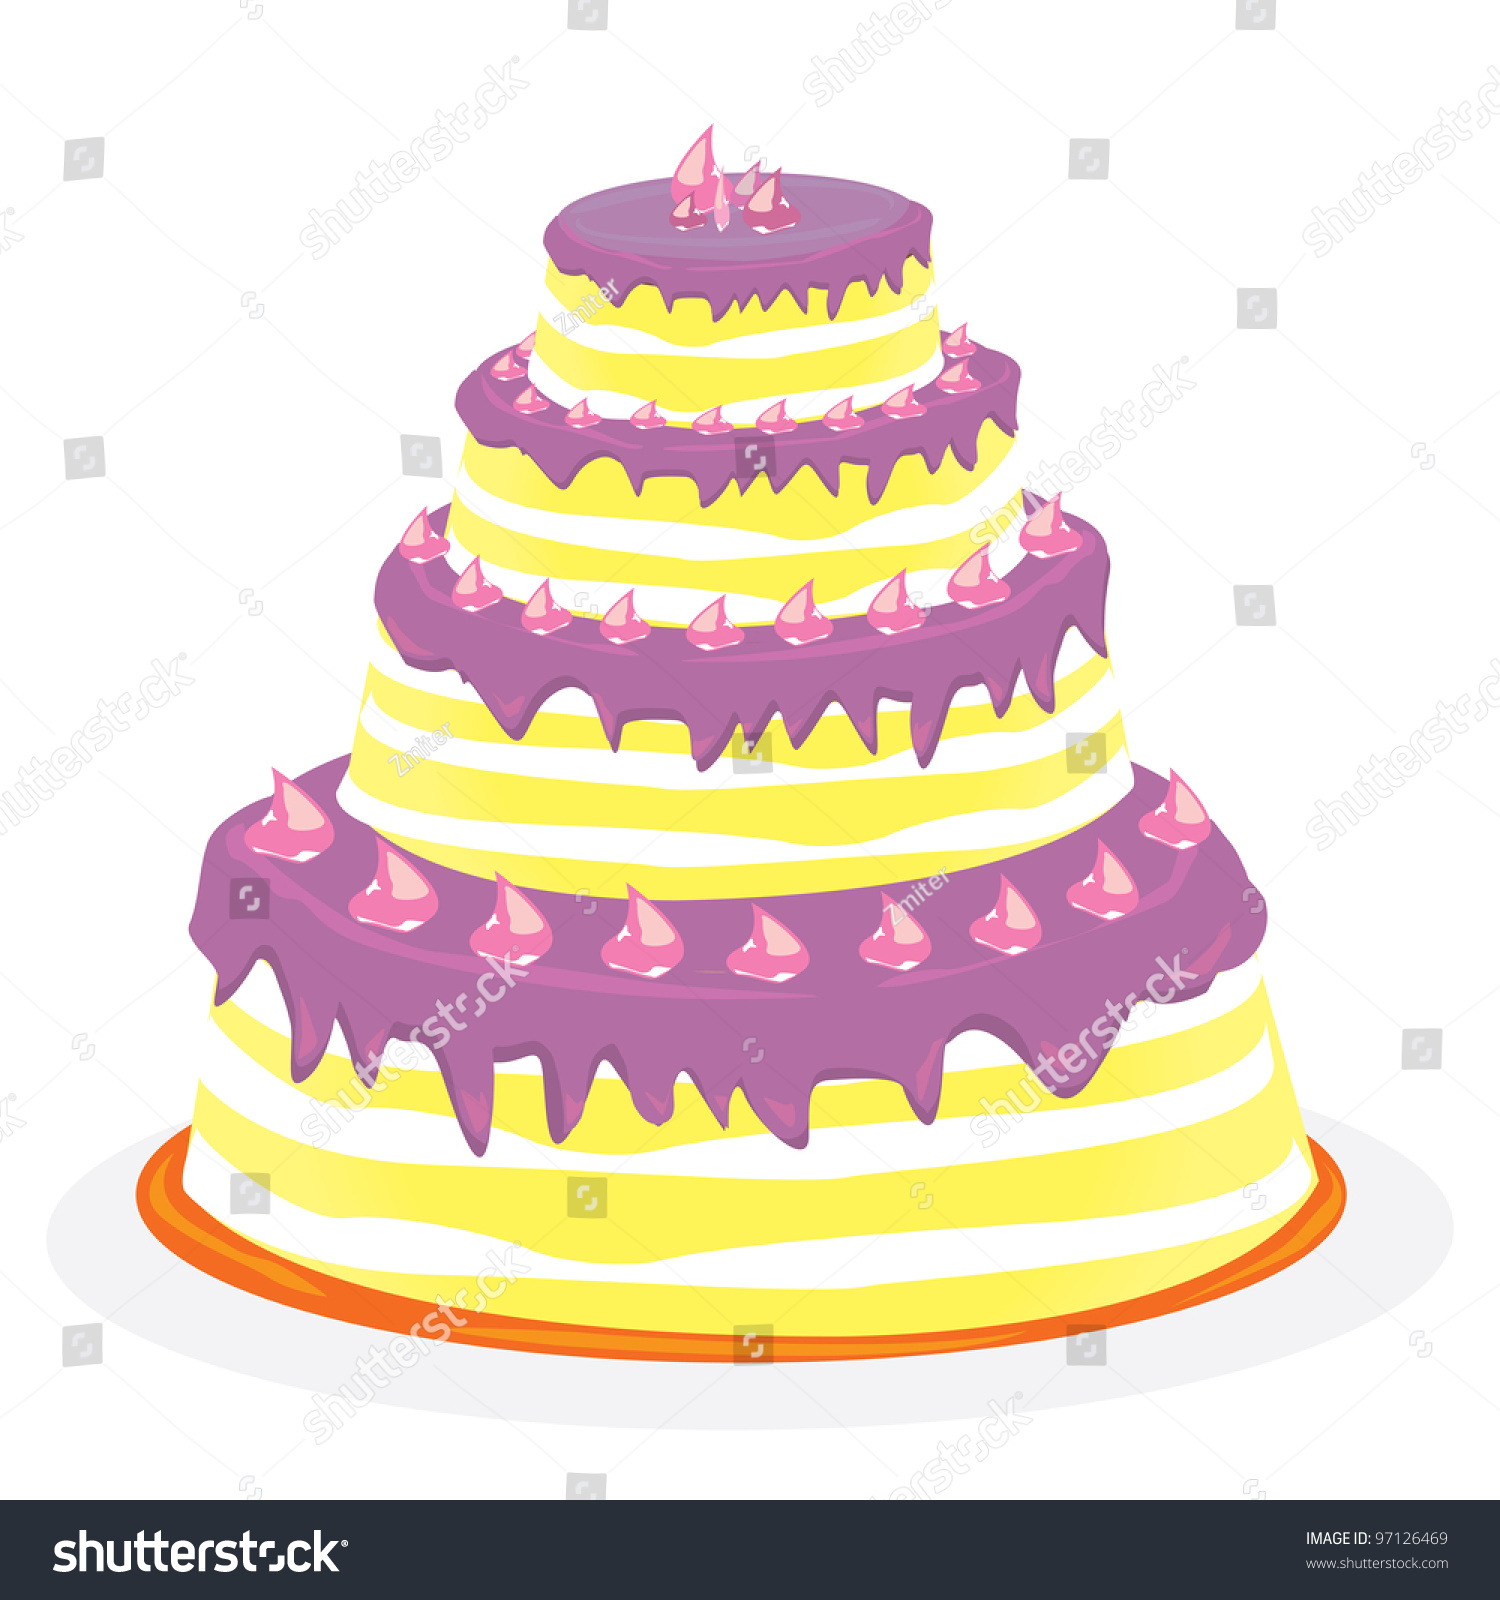 Flat vector festive wedding cake illustration. Objects isolated on ...